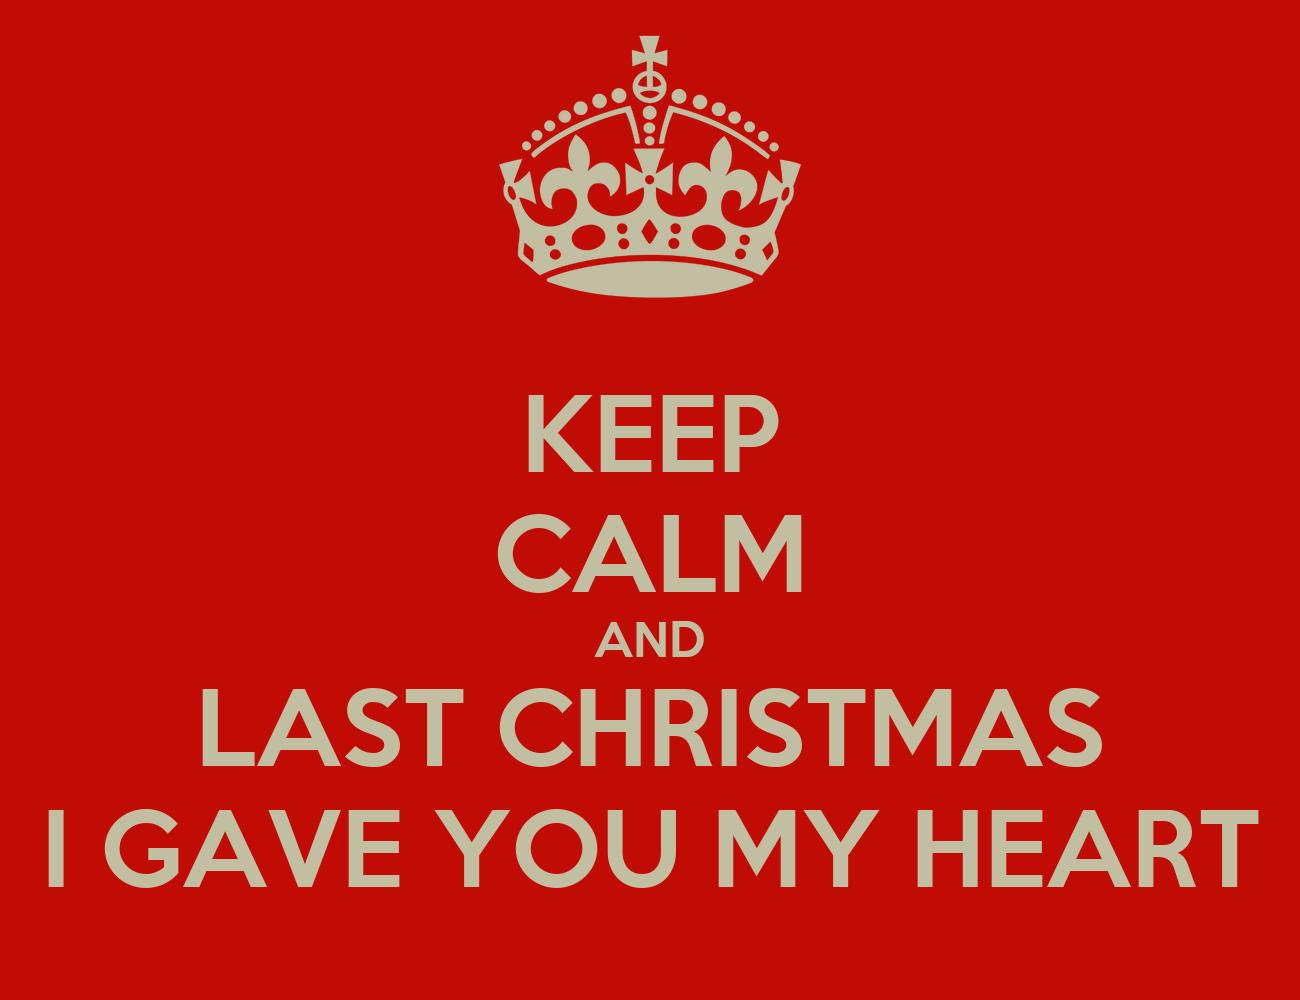 last christmas i gave you my heard: